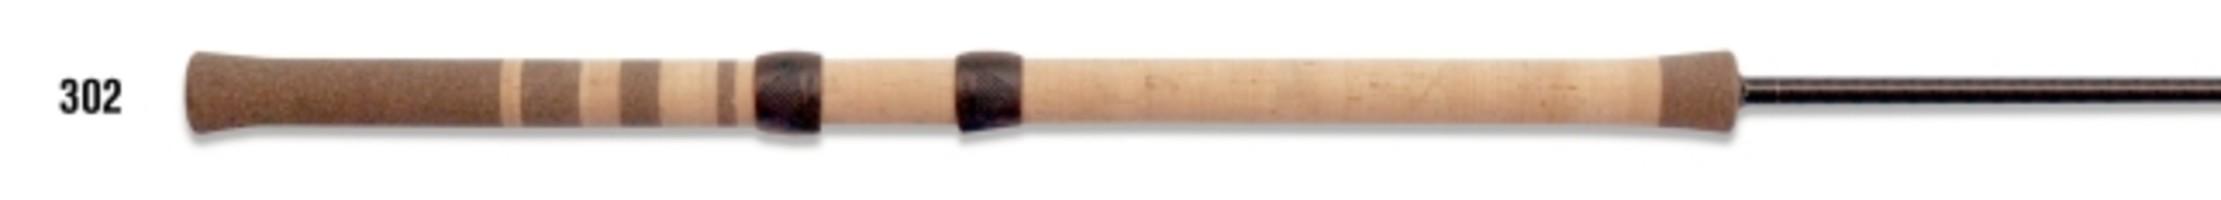 g loomis center pin conventional salmon  steelhead rod